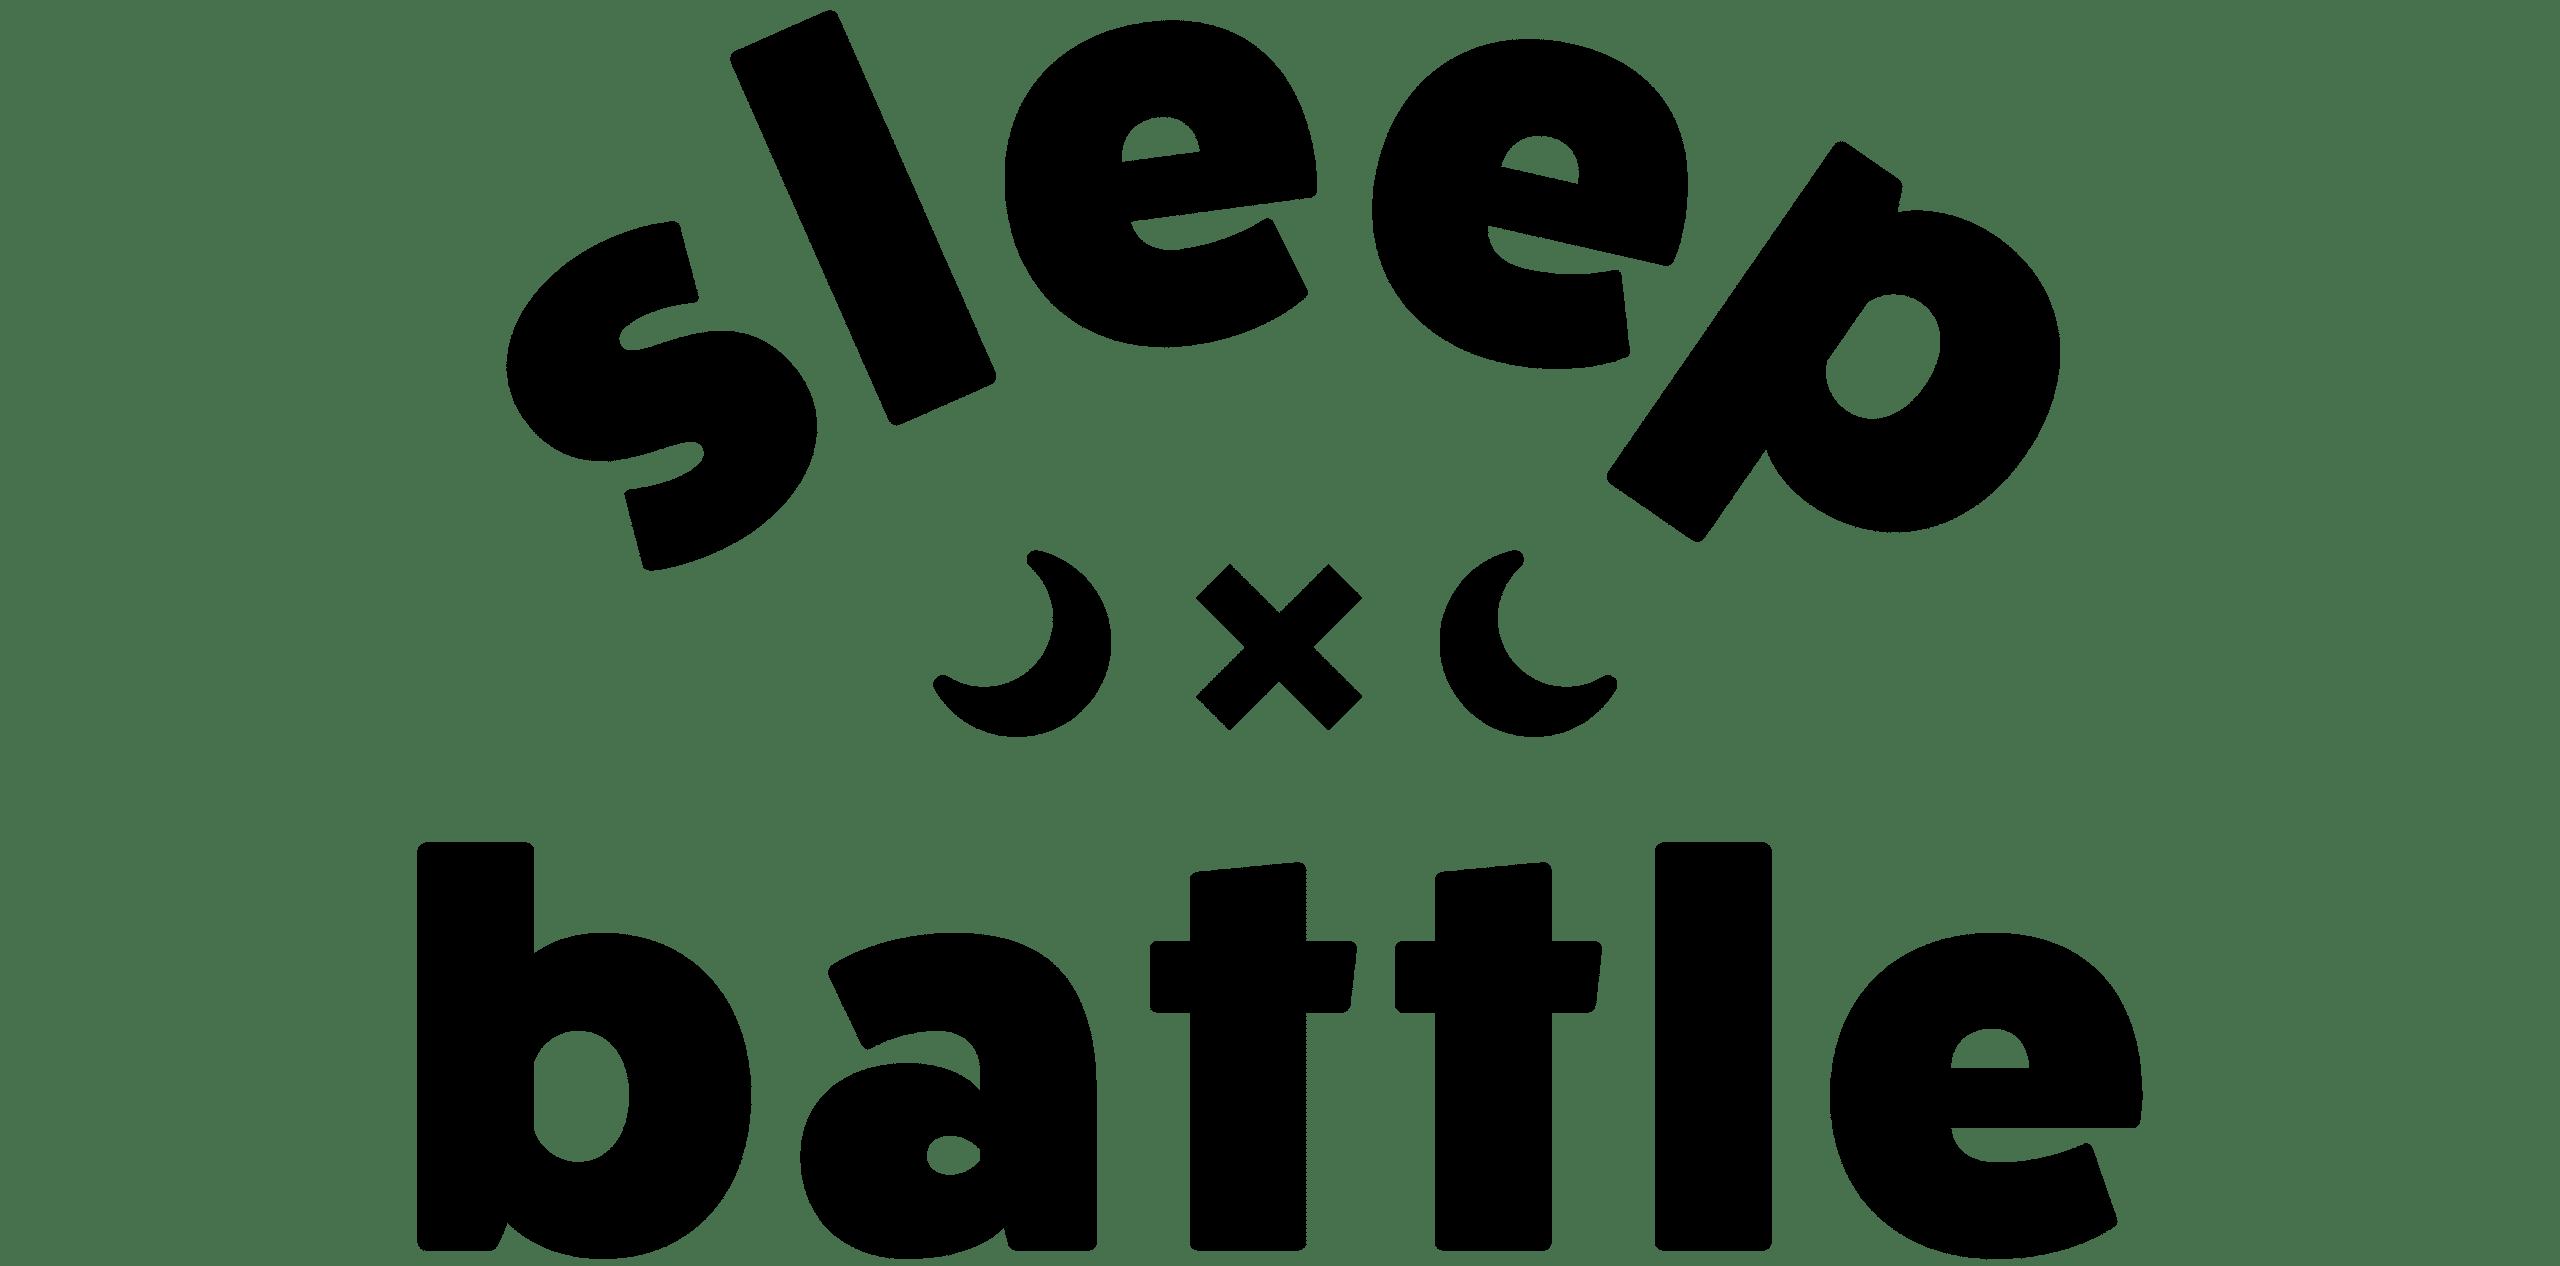 Sleep Battle